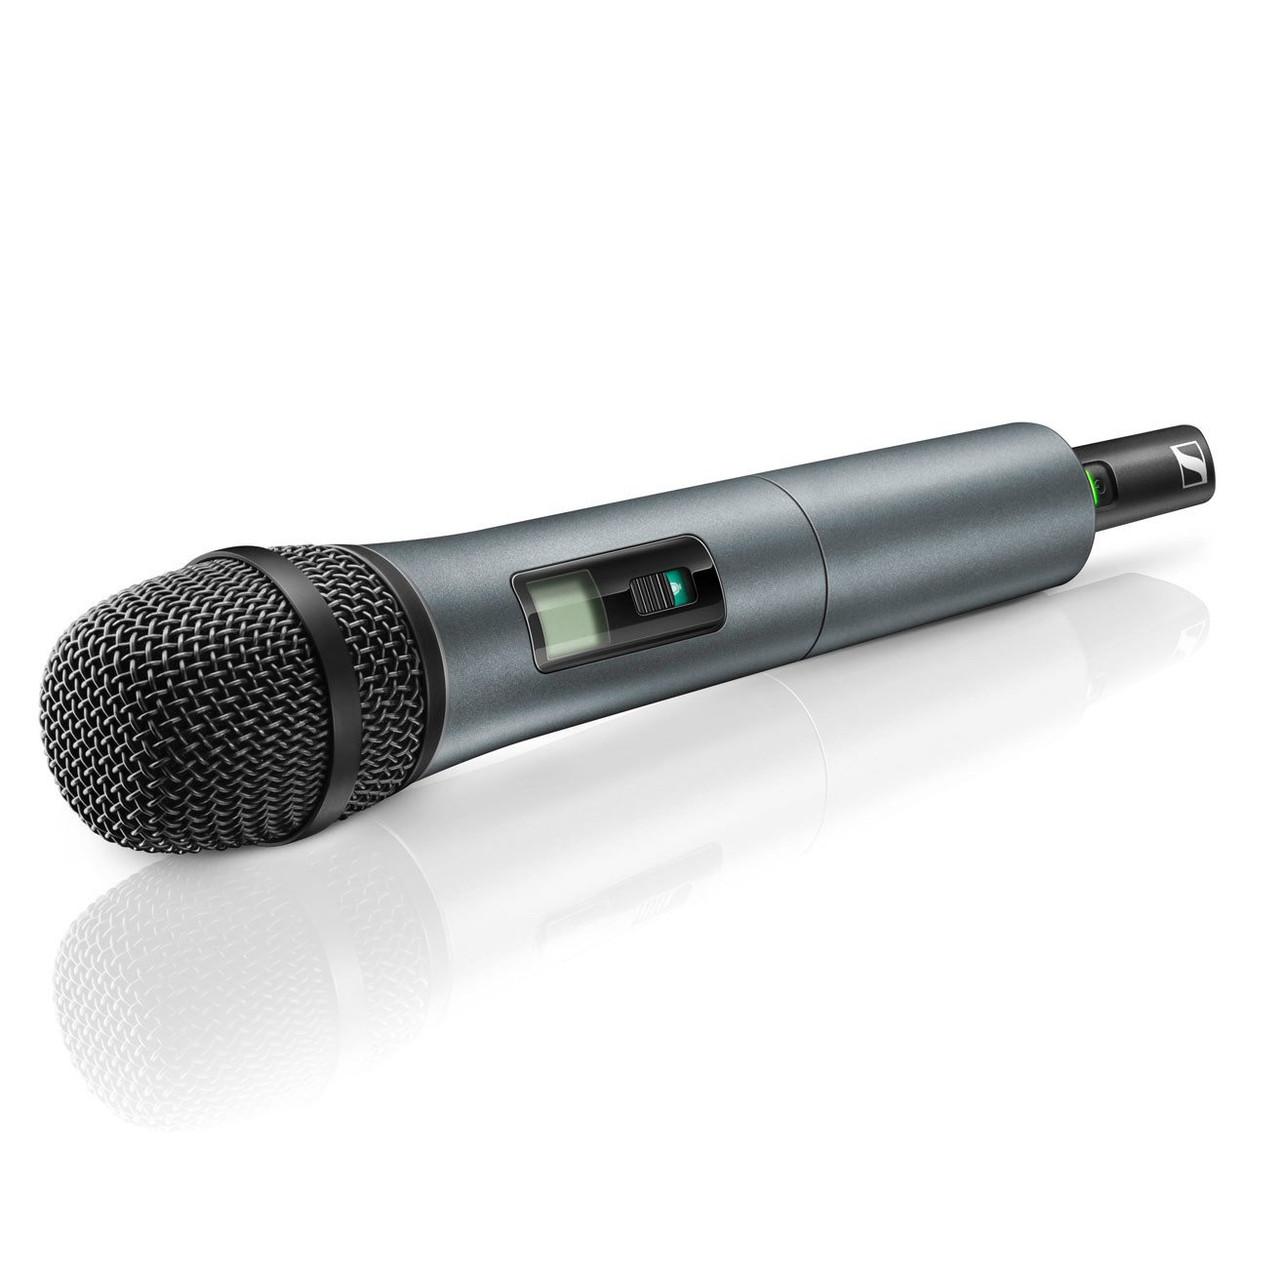 Sennheiser XSW2-835 Wireless Vocal Microphone System